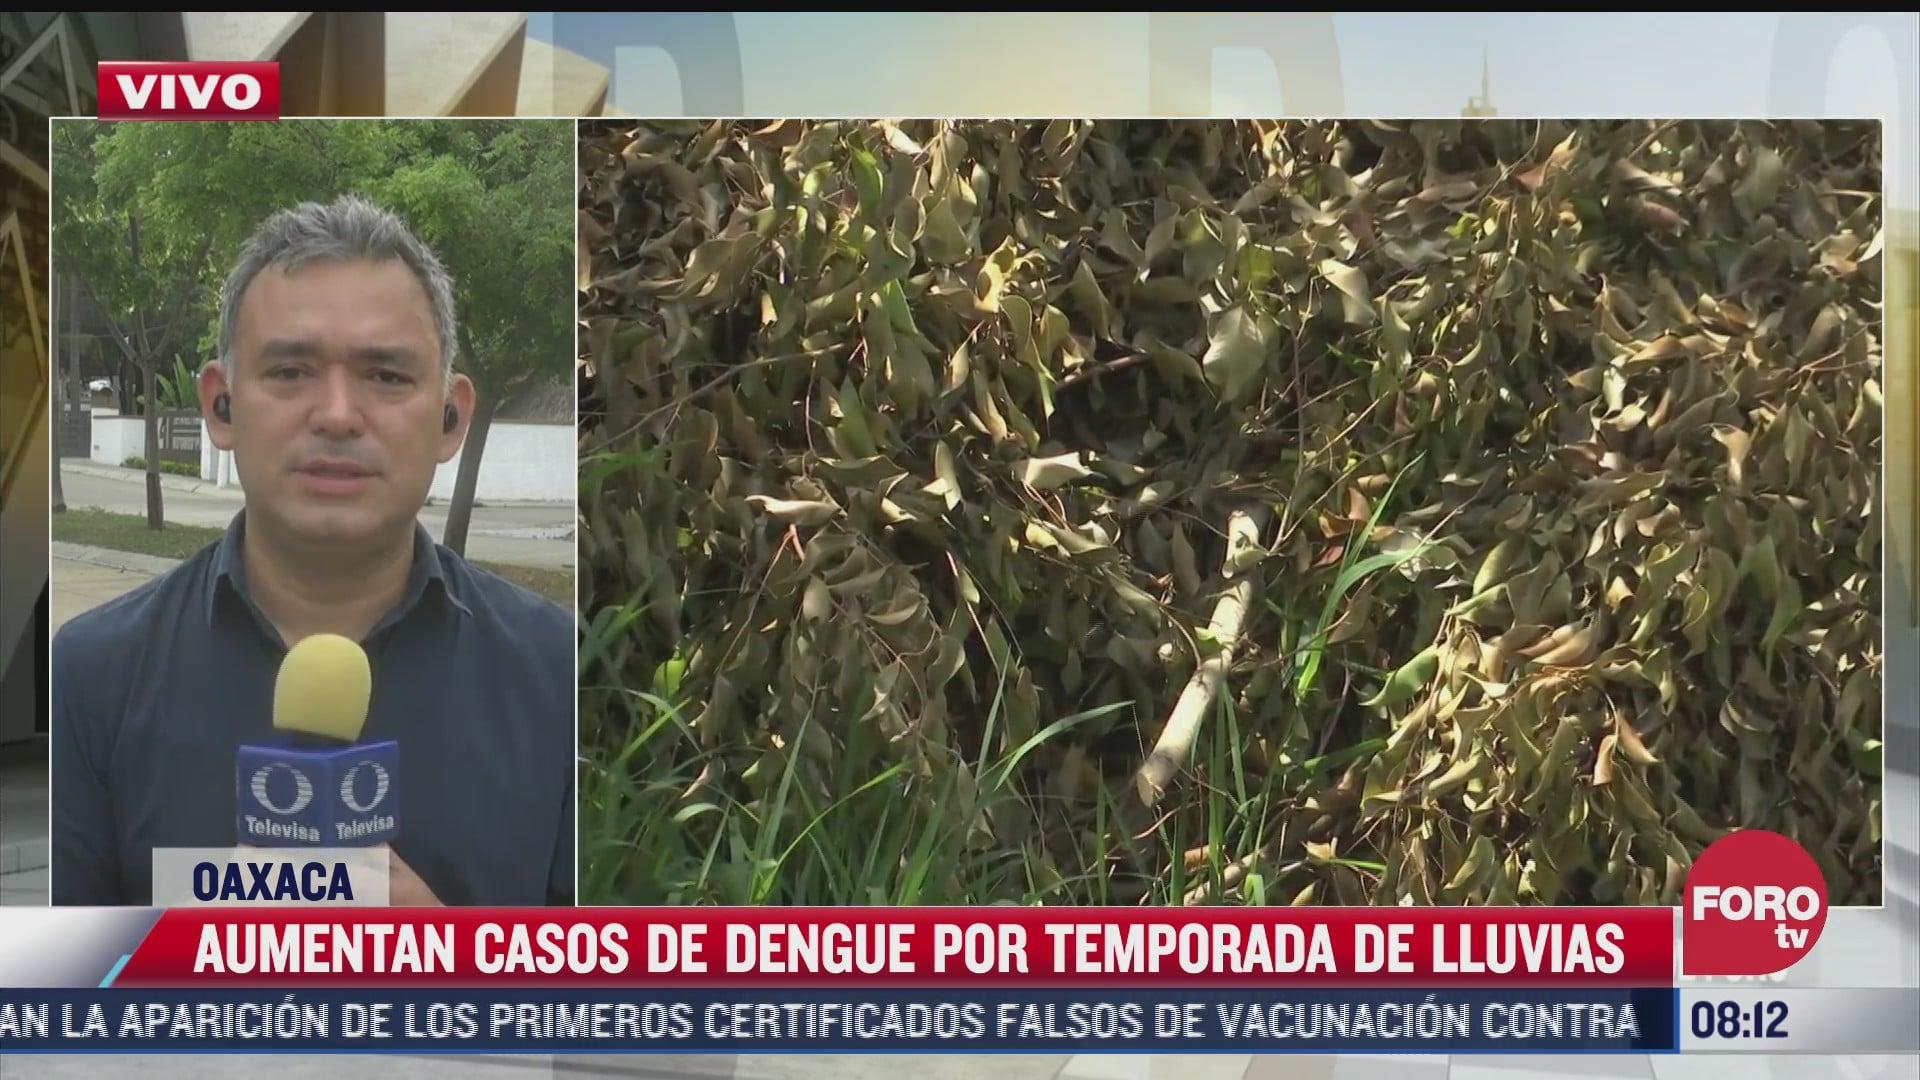 lluvias provocan incremento de casos de dengue en oaxaca